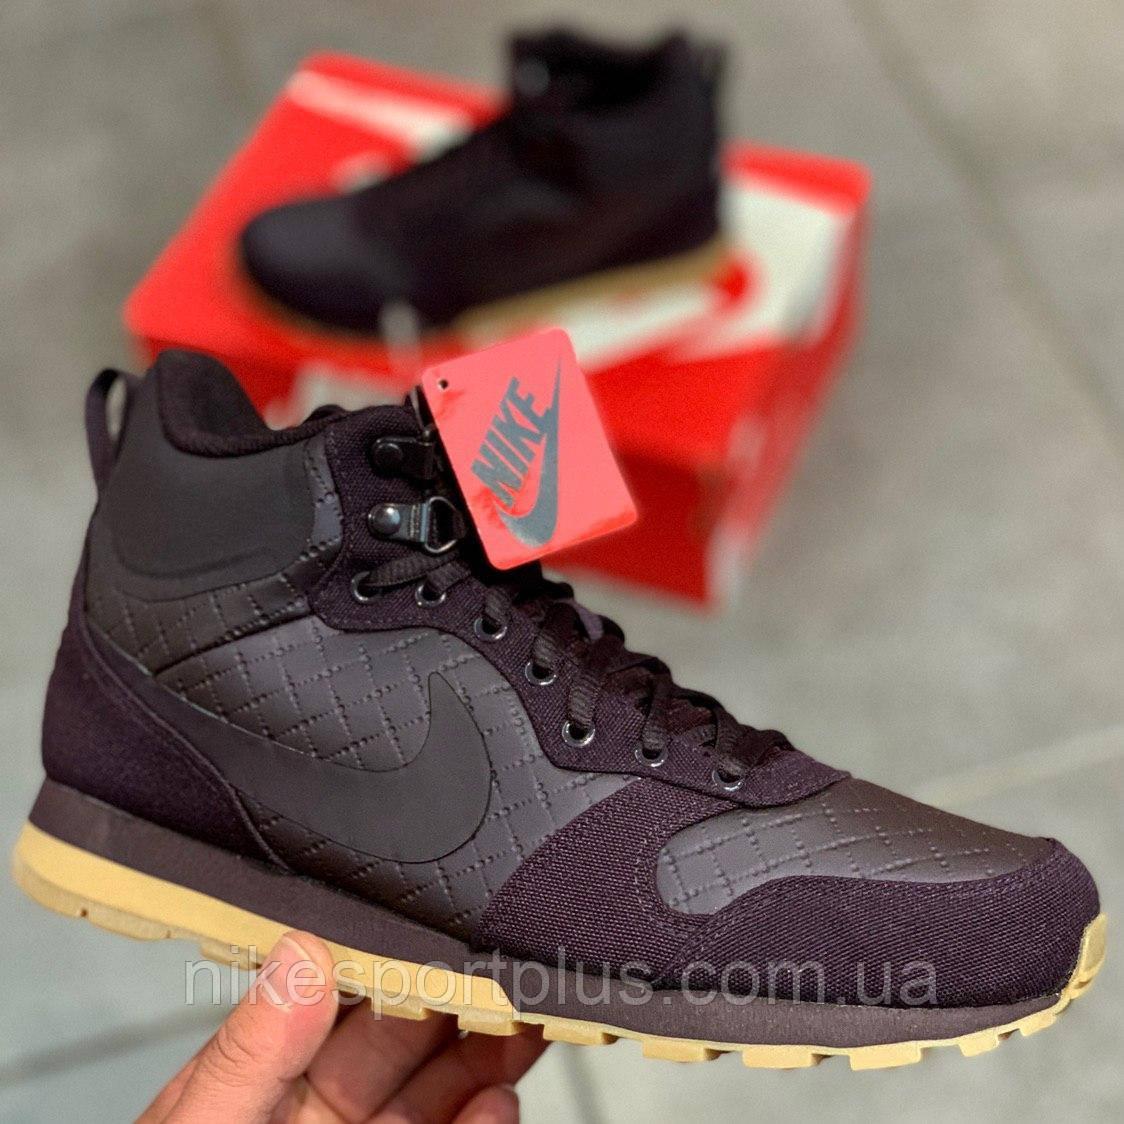 КРОССОВКИ Men's Nike MD Runner 2 Mid Premium Shoe 844864-600